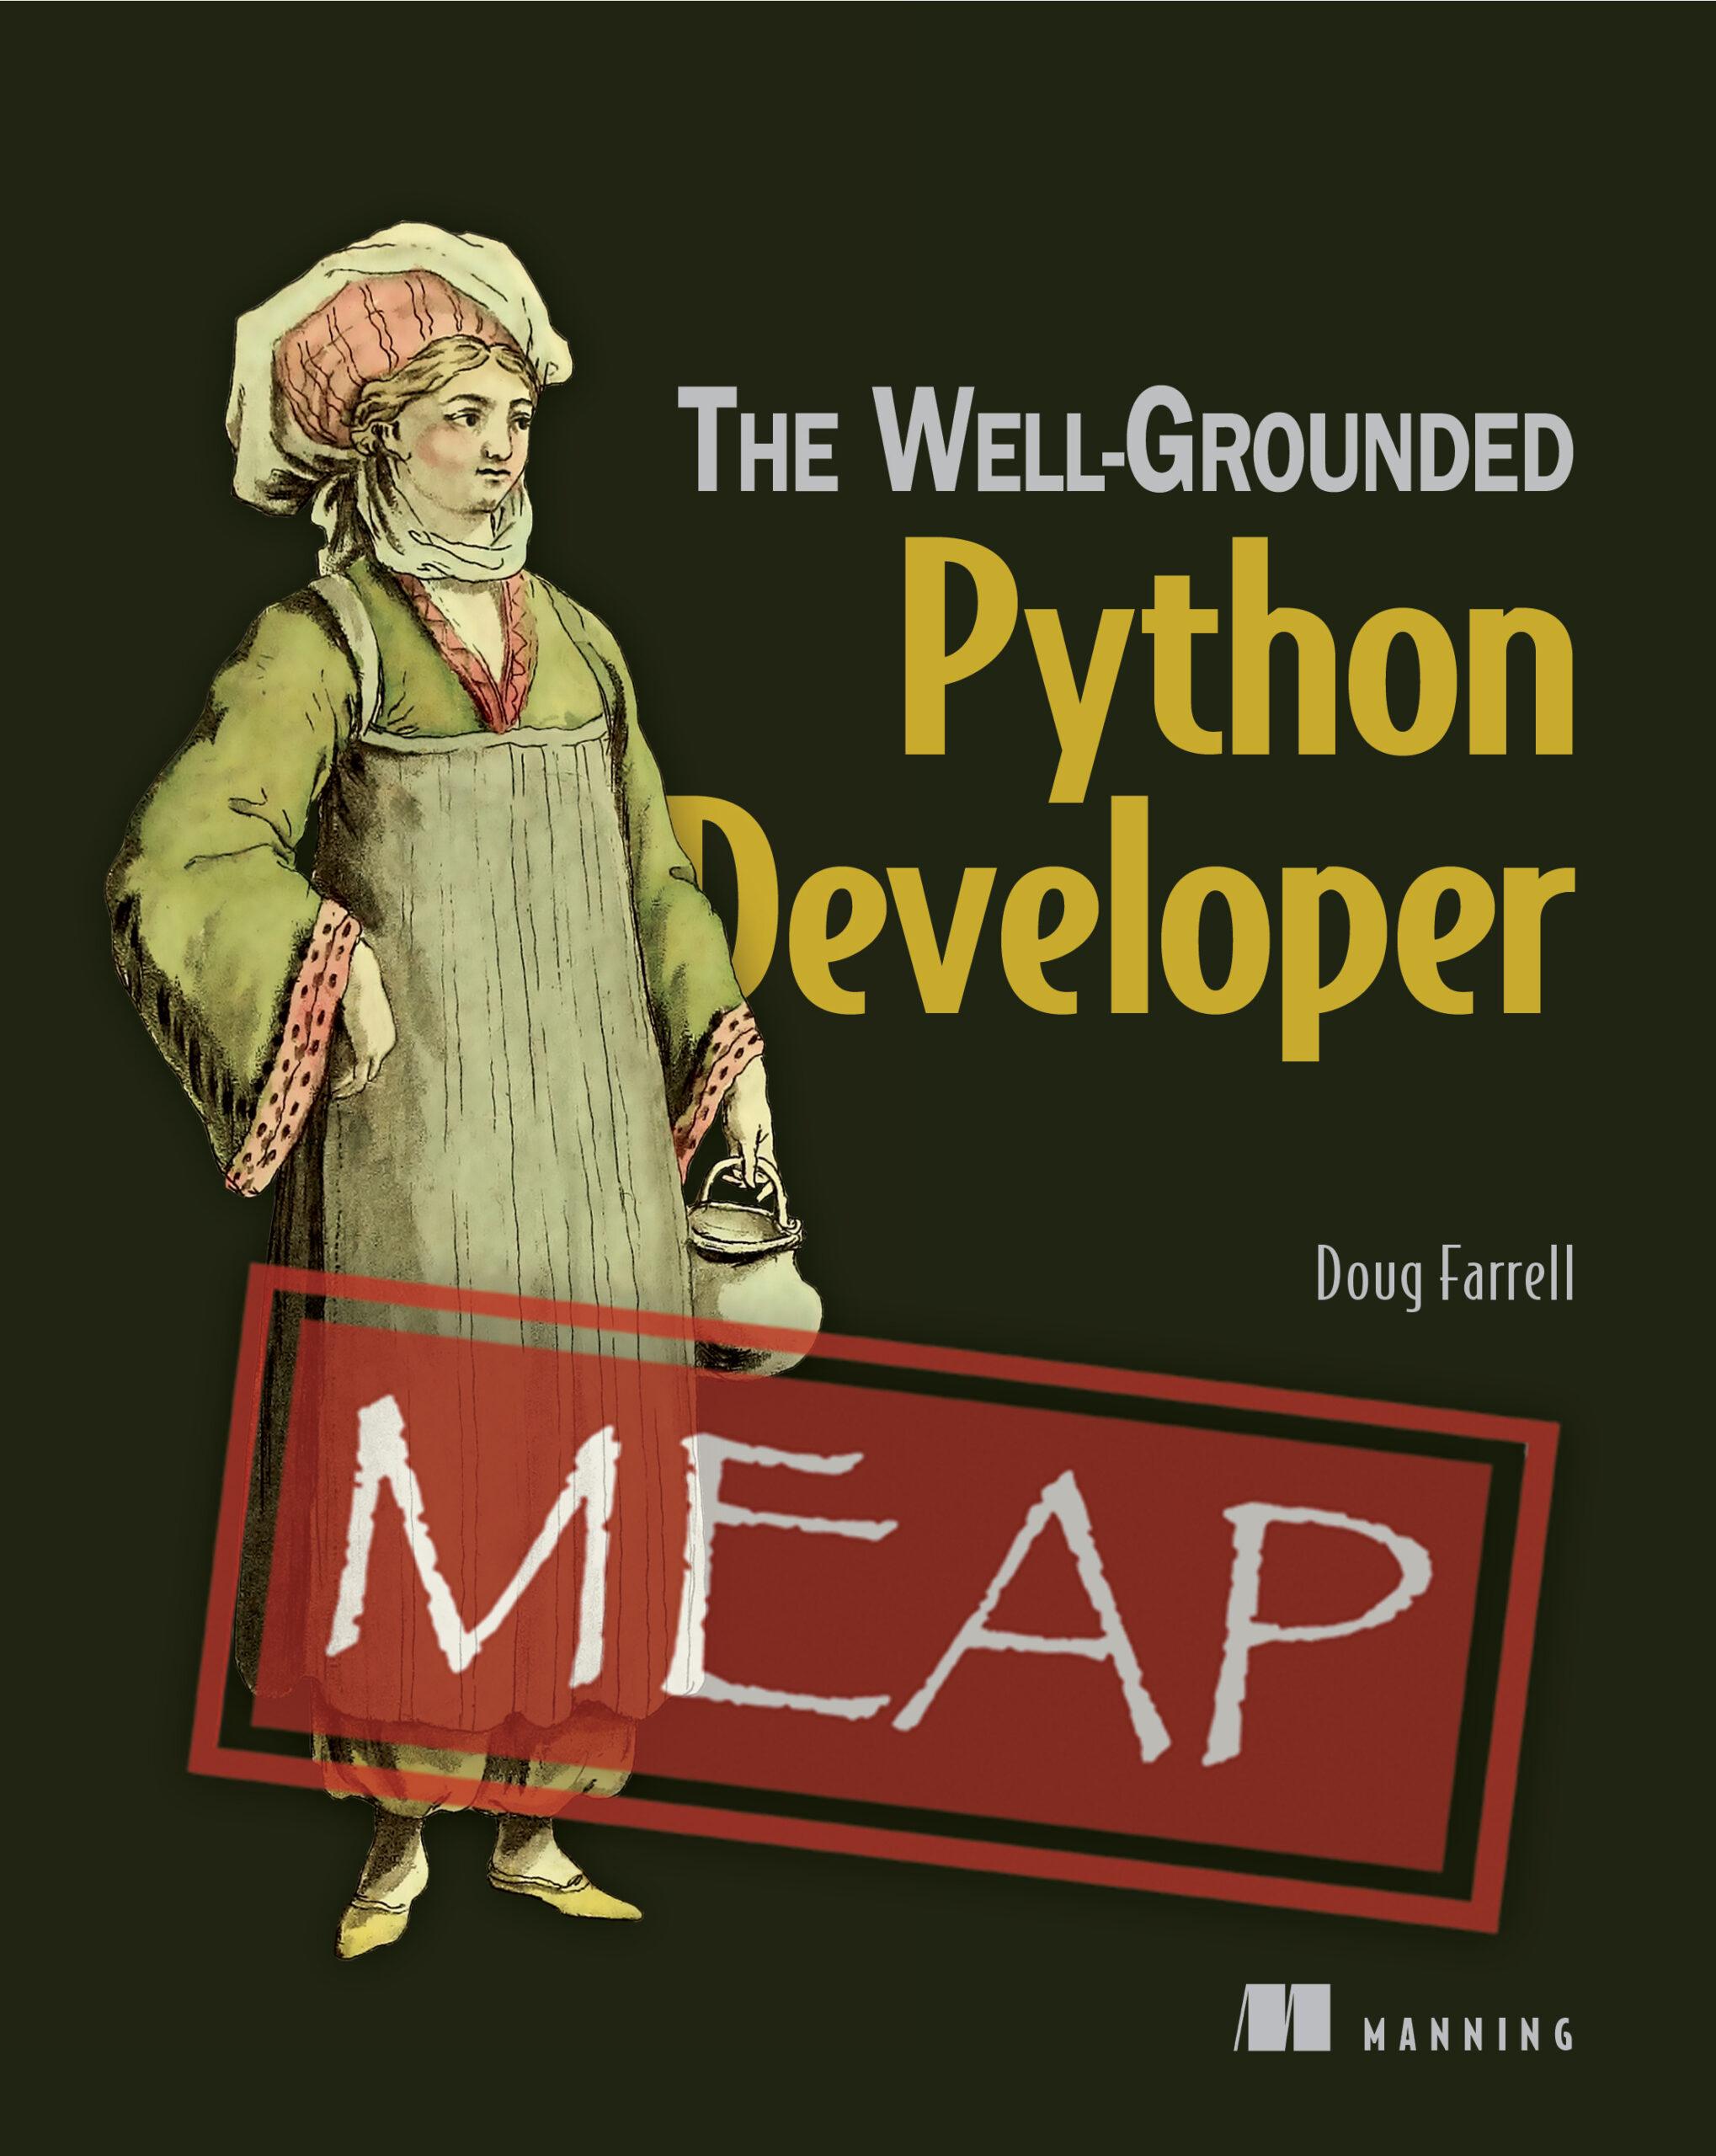 The Well-Grounded Python Developer